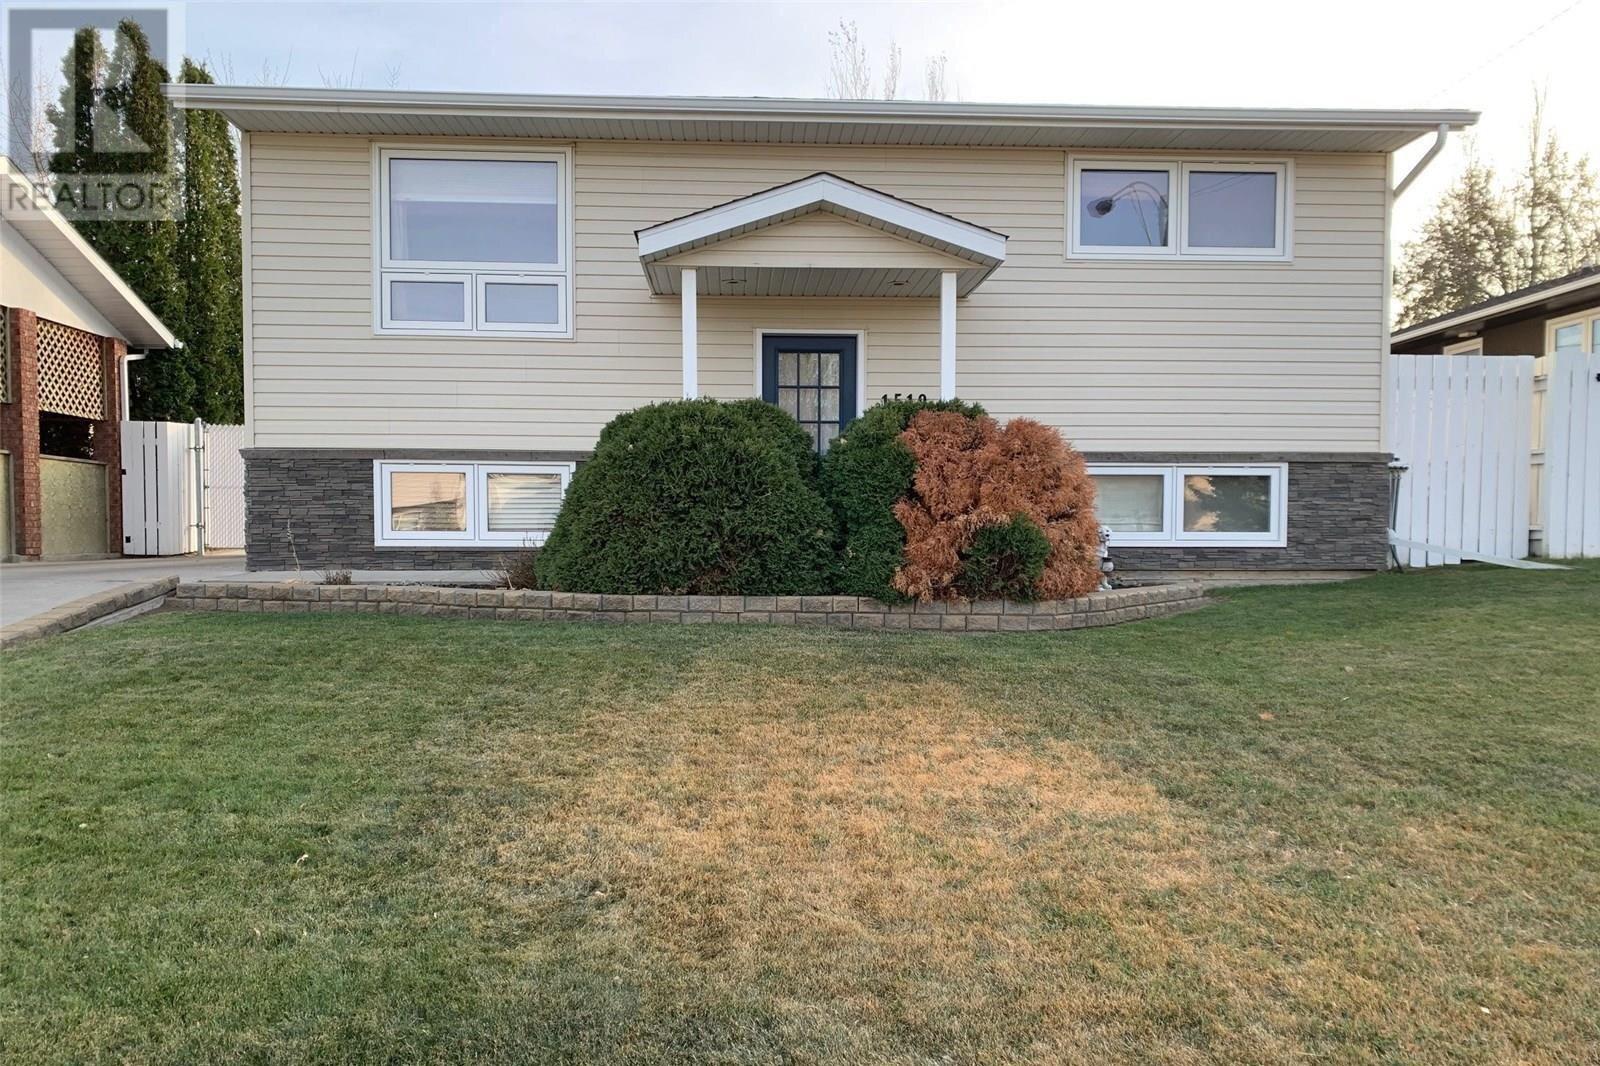 House for sale at 1519 Grandview St SW Moose Jaw Saskatchewan - MLS: SK831856